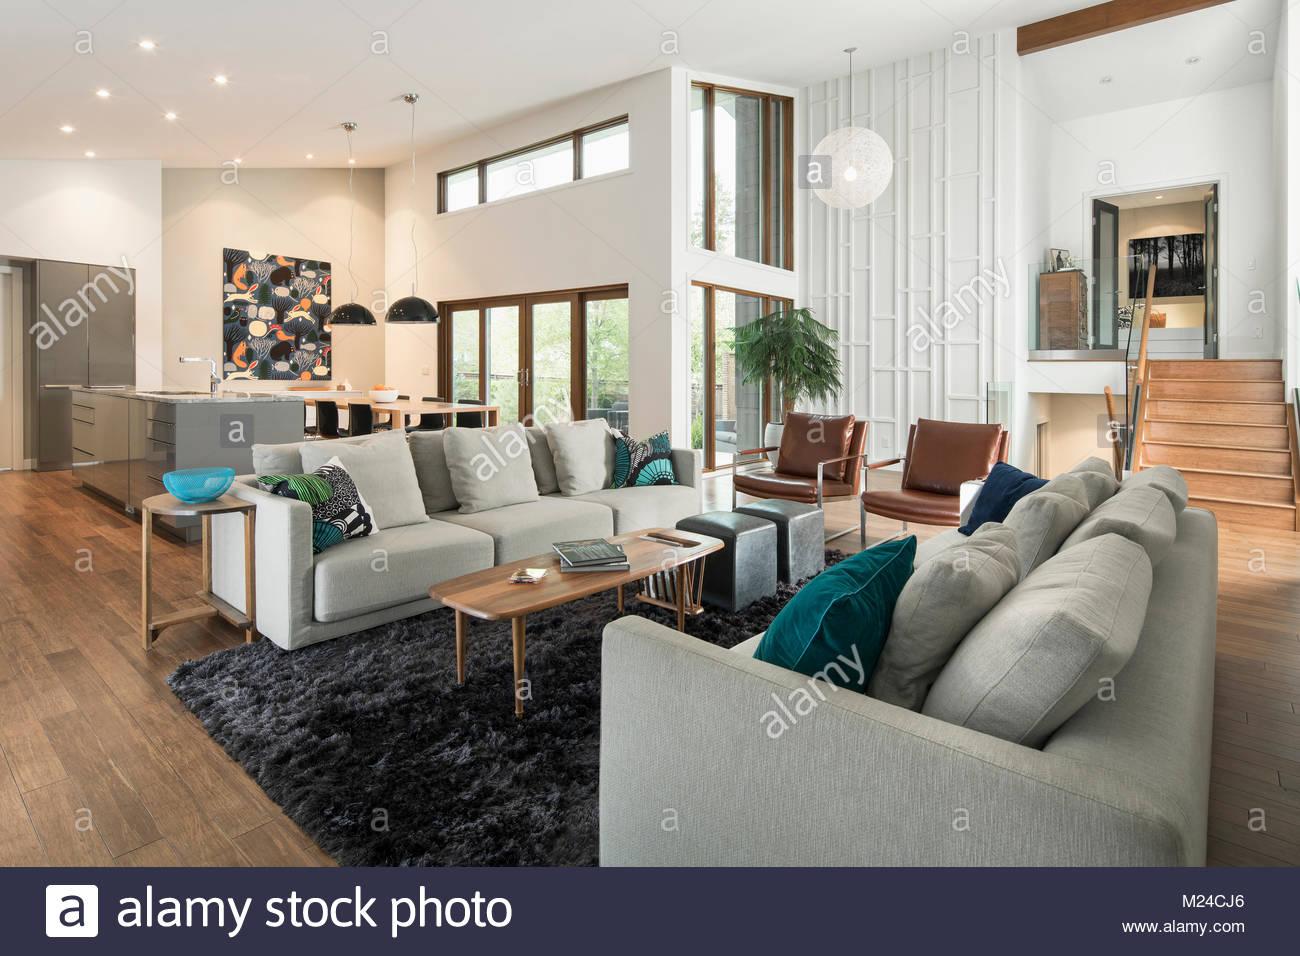 Home showcase mid-century modern open plan living room - Stock Image